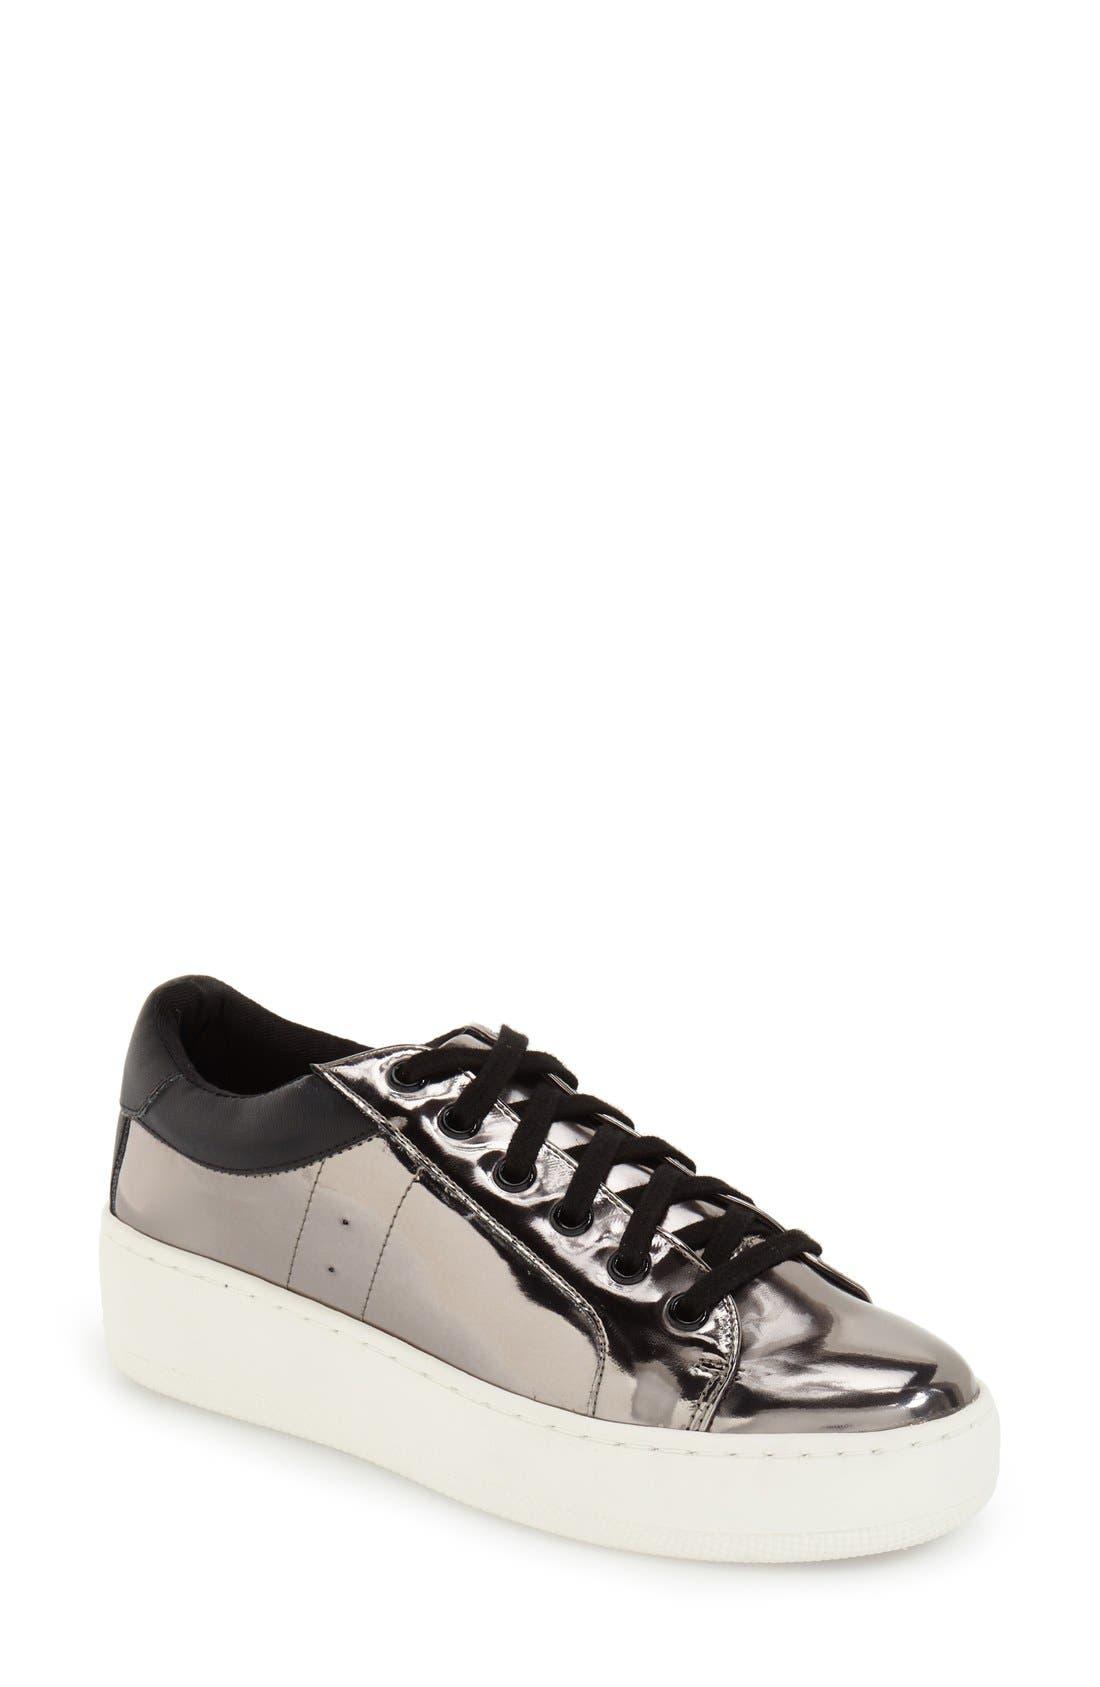 Main Image - Steve Madden Bertie Metallic Platform Sneaker (Women)